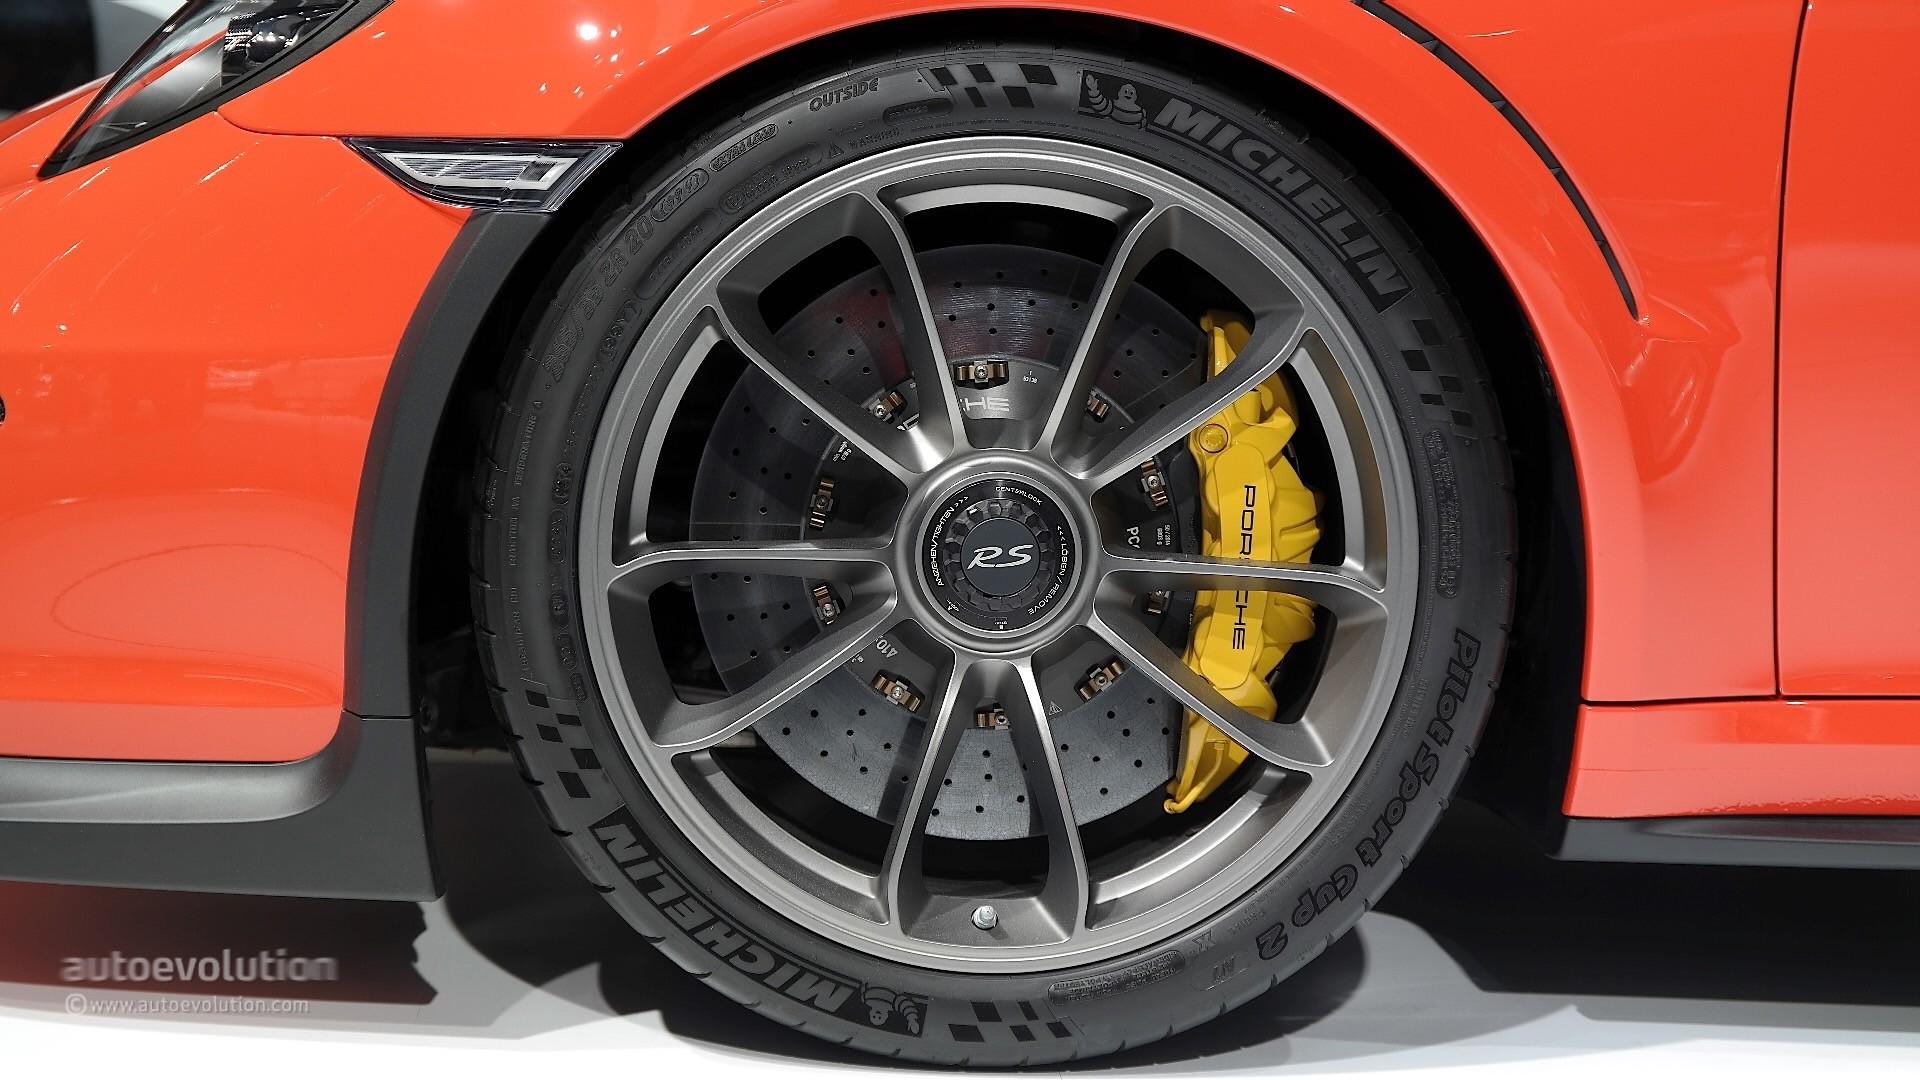 porsche 911 gt3 rs gets 911 rsr mid engined racecar livery. Black Bedroom Furniture Sets. Home Design Ideas